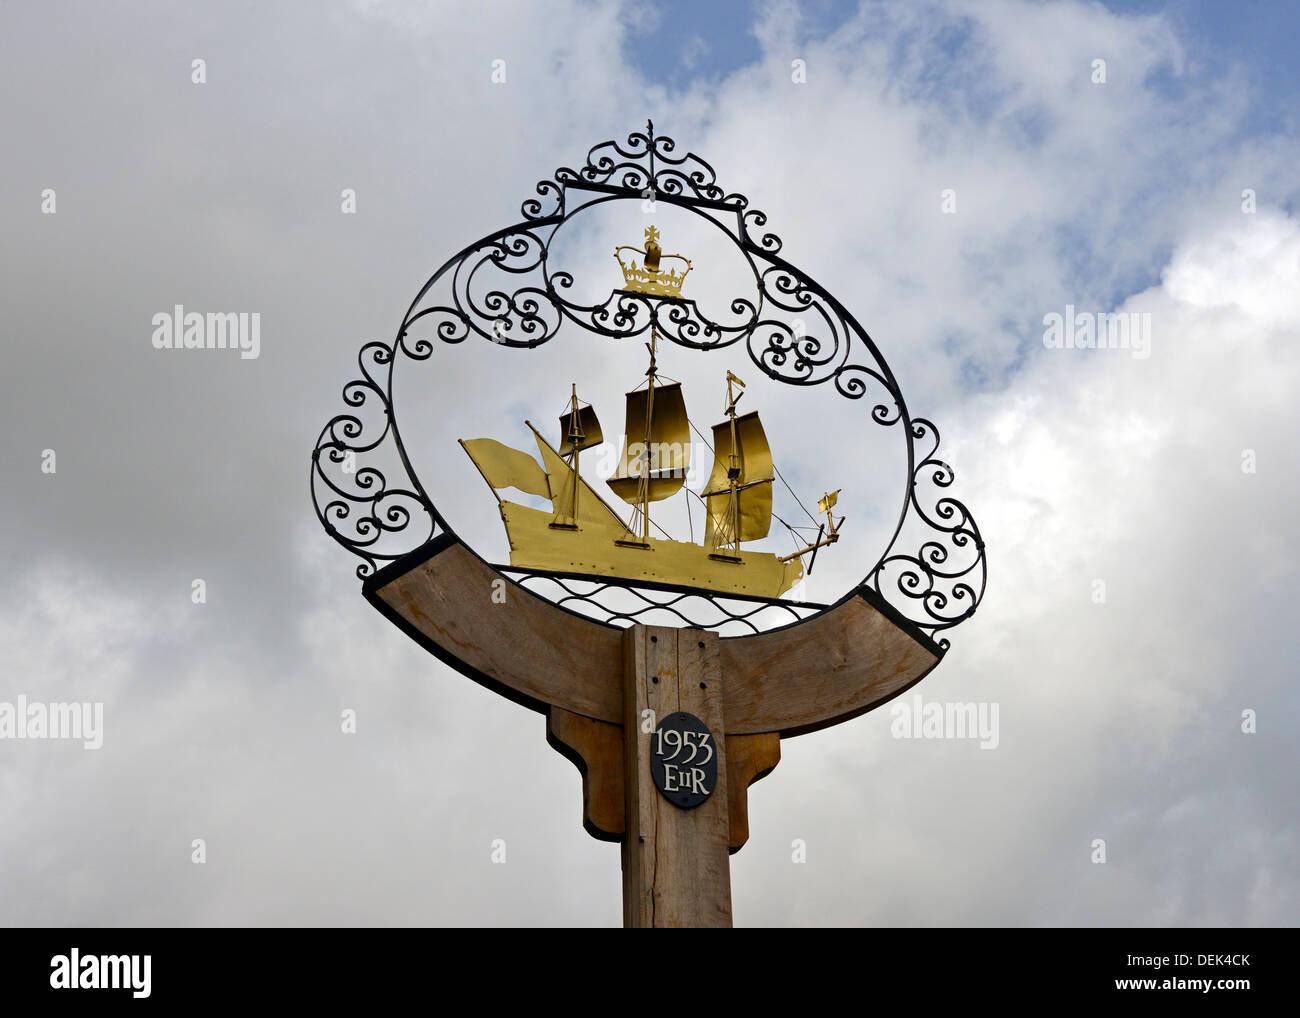 Village sign. Walberswick, Suffolk, England, United Kingdom, Europe. - Stock Image